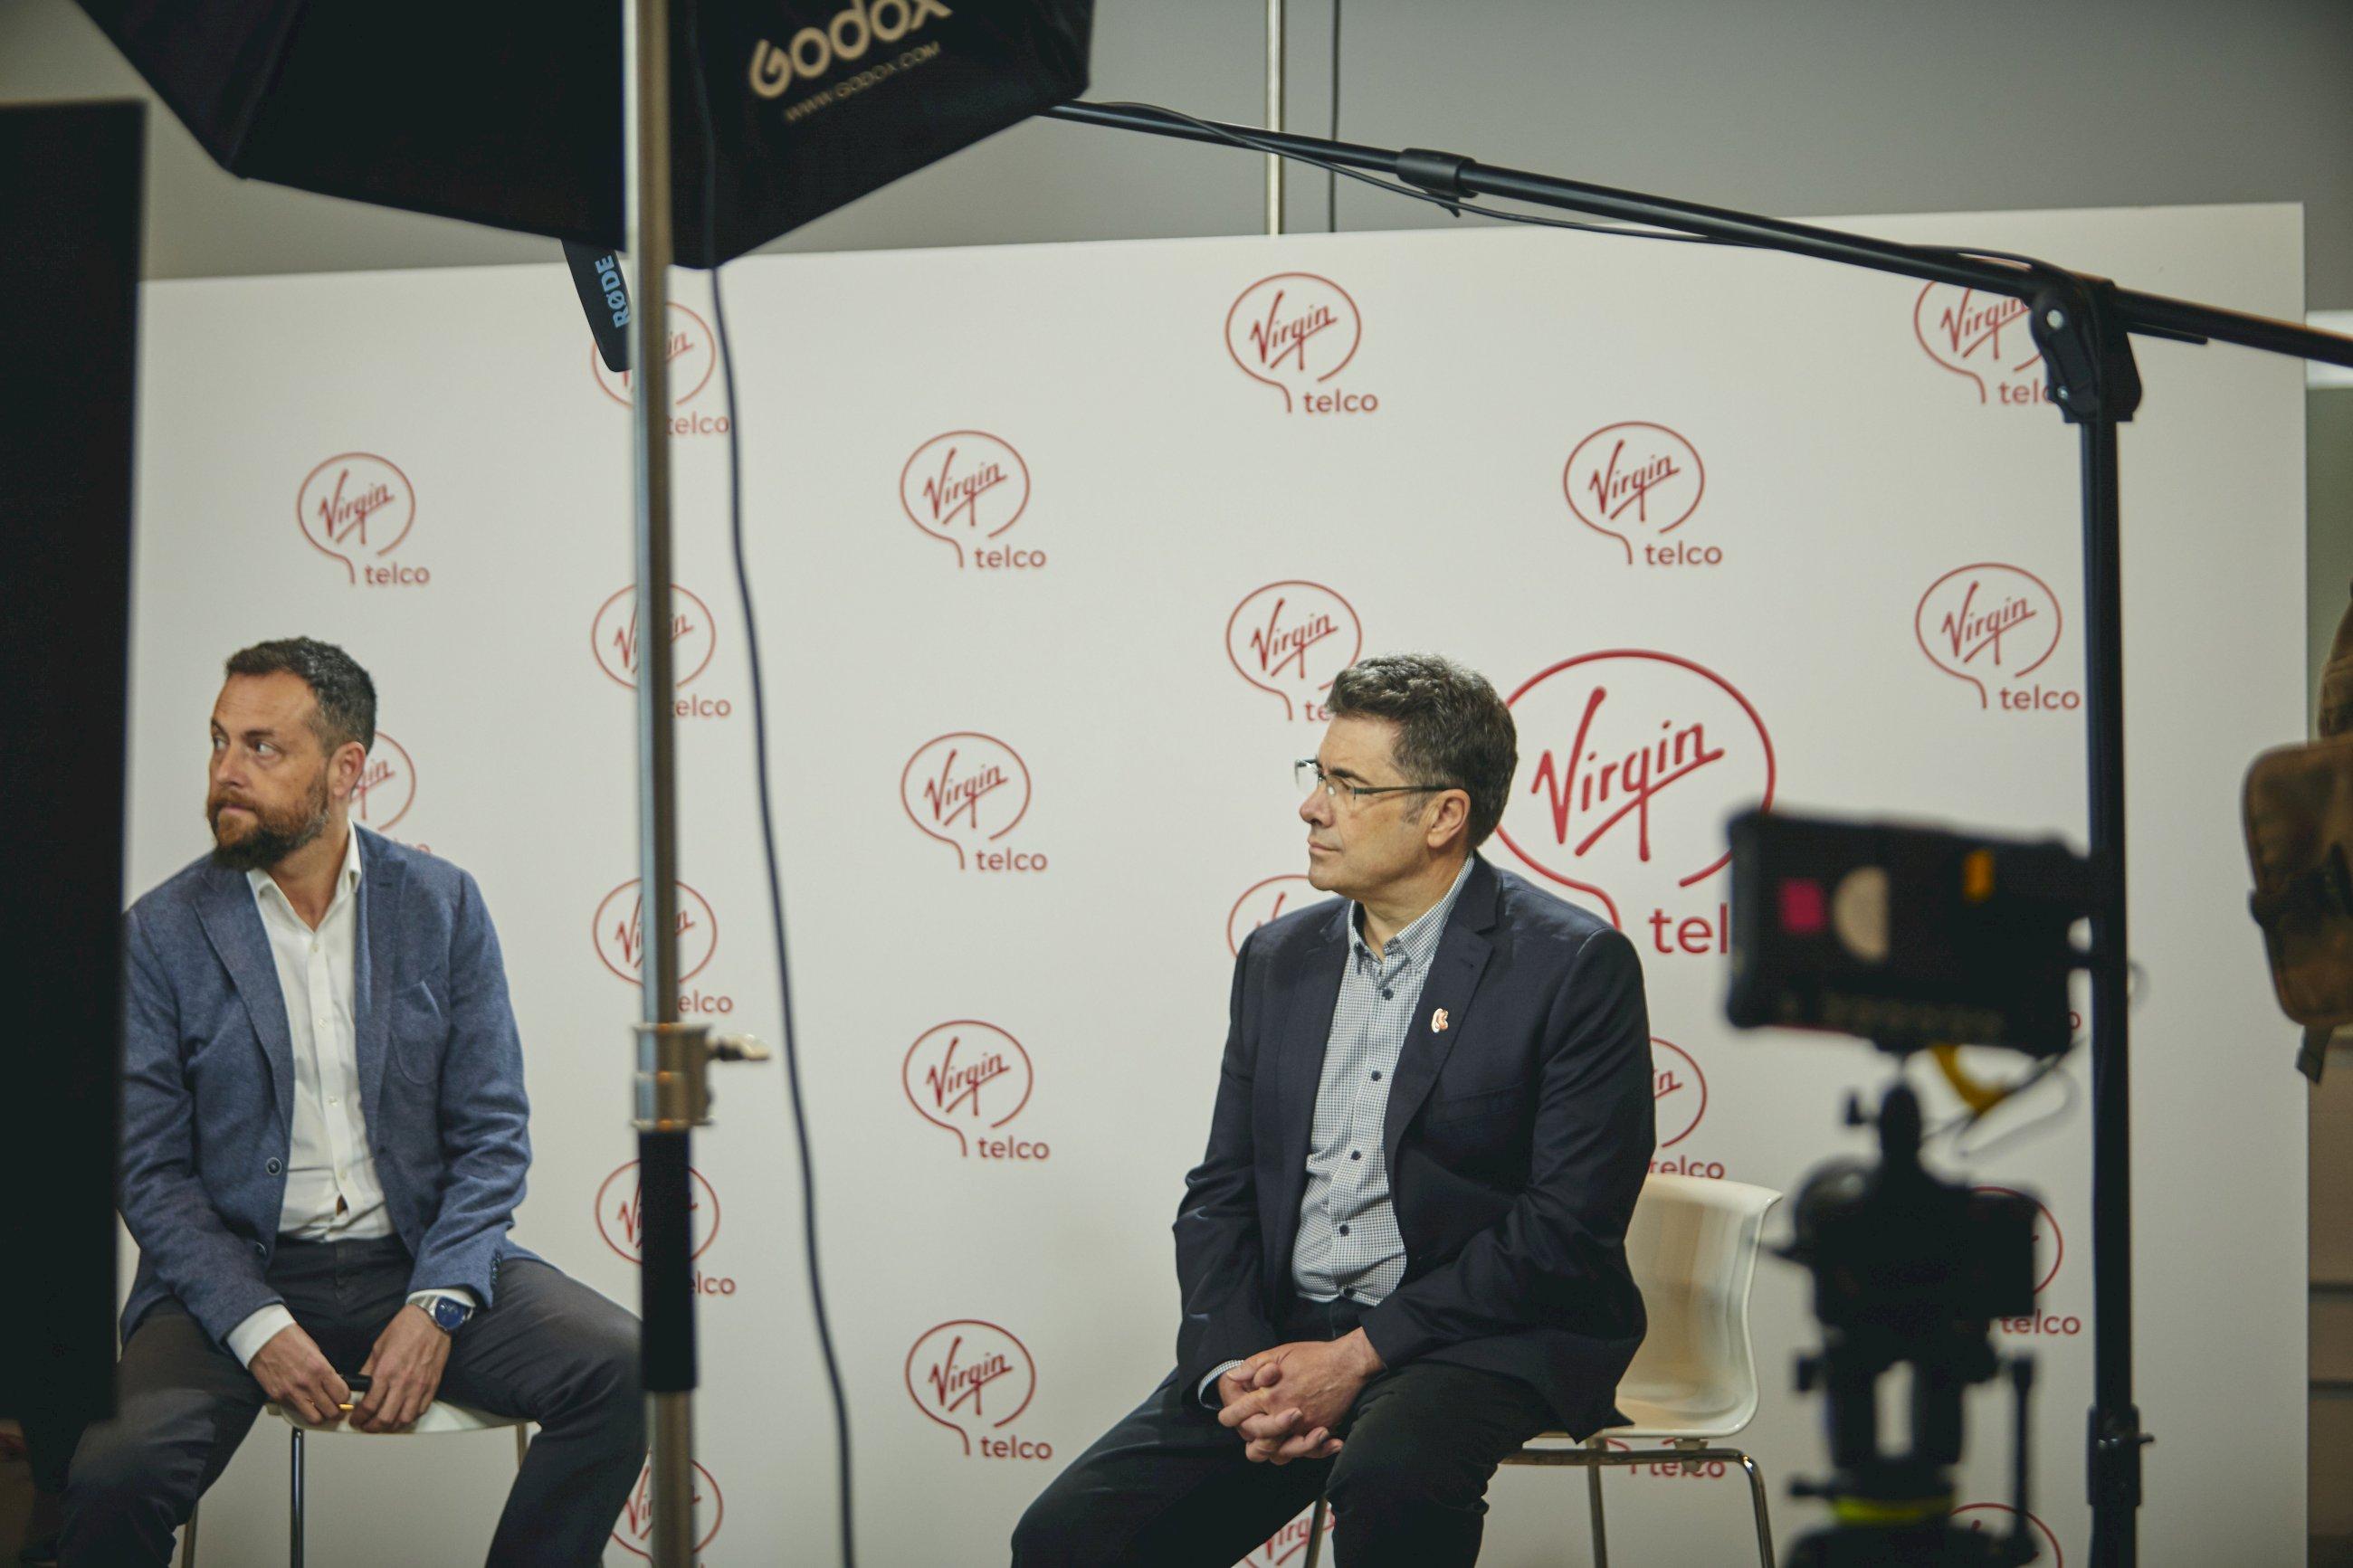 La misteriosa 'factura' de Virgin tras la alianza con Euskaltel